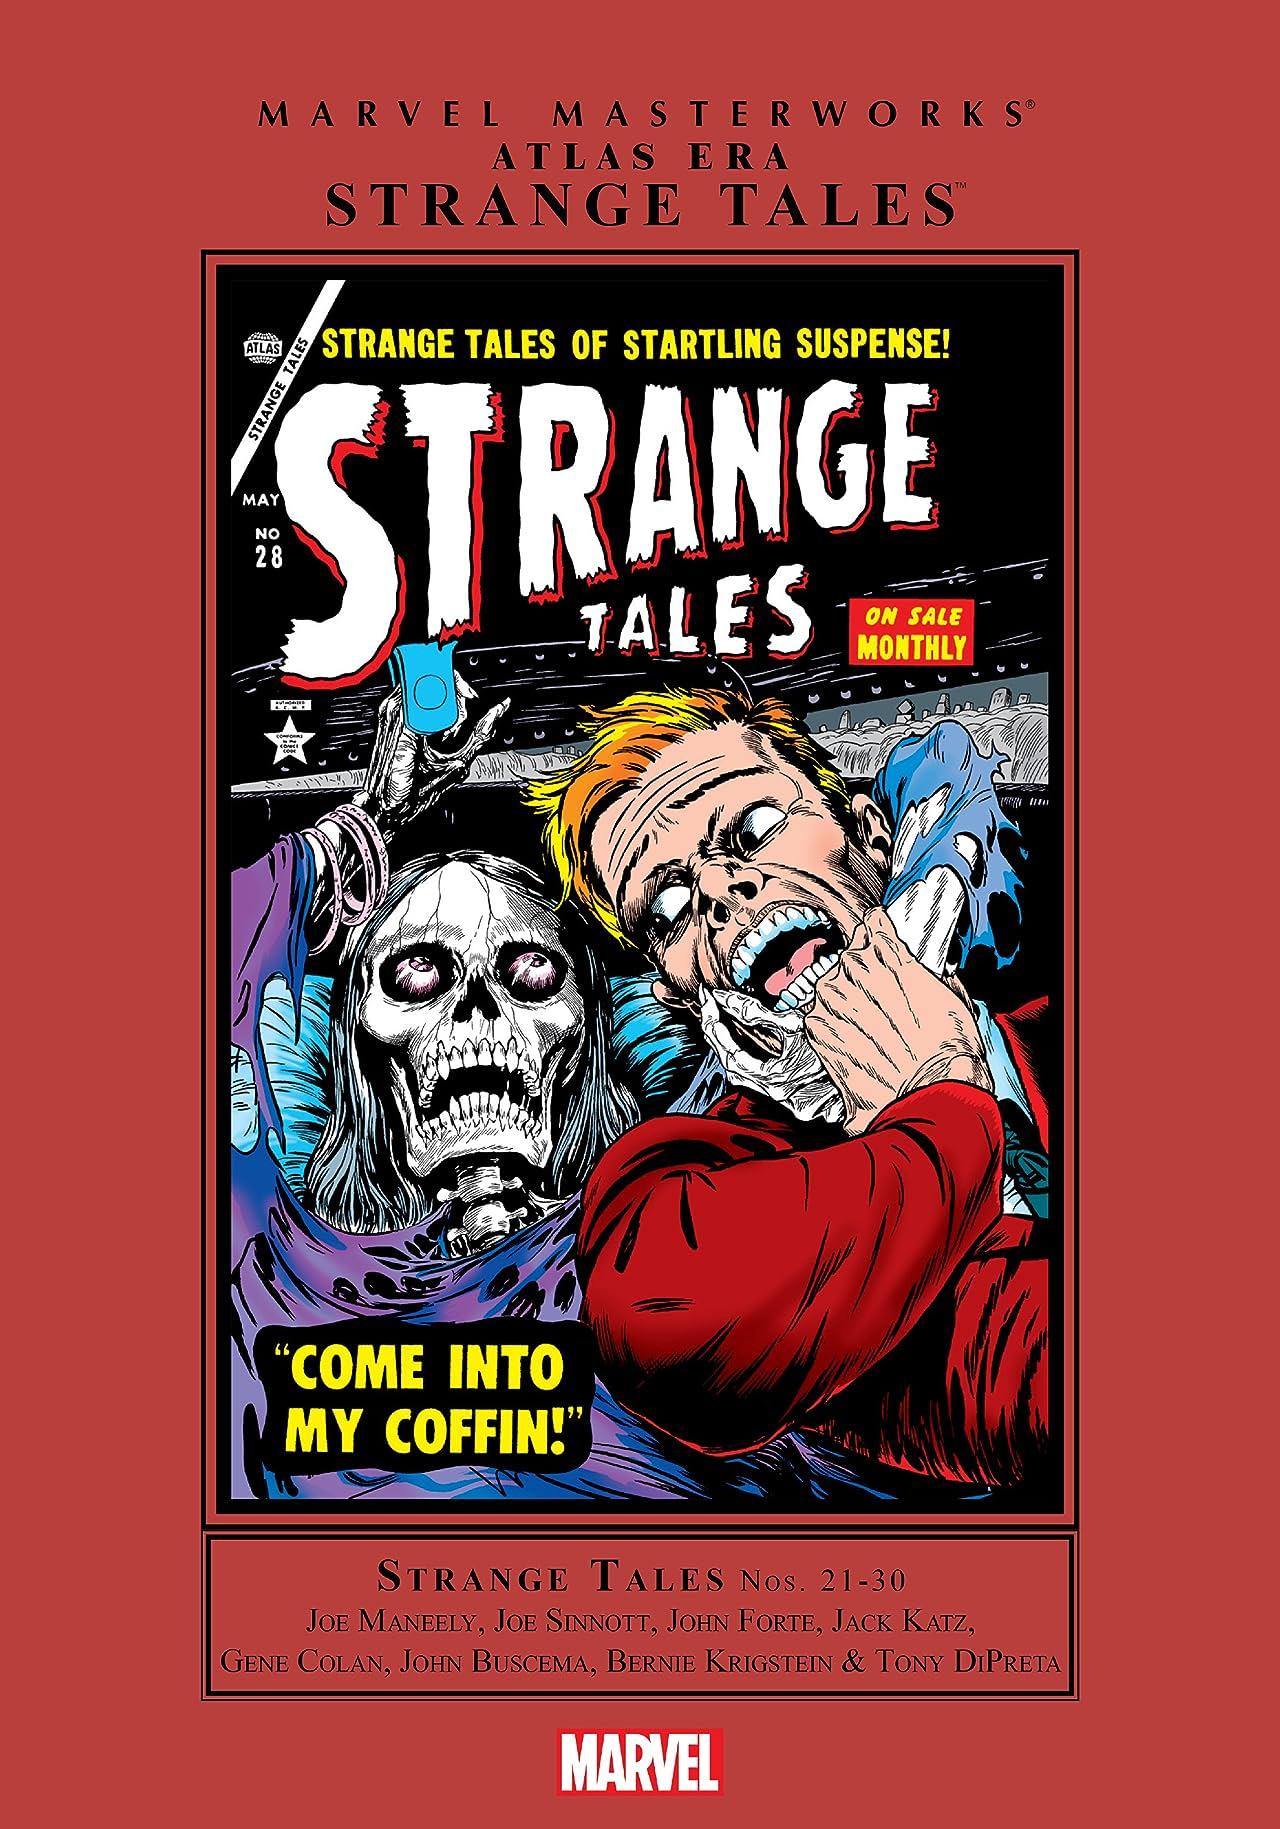 Atlas Era Strange Tales Masterworks Vol. 3